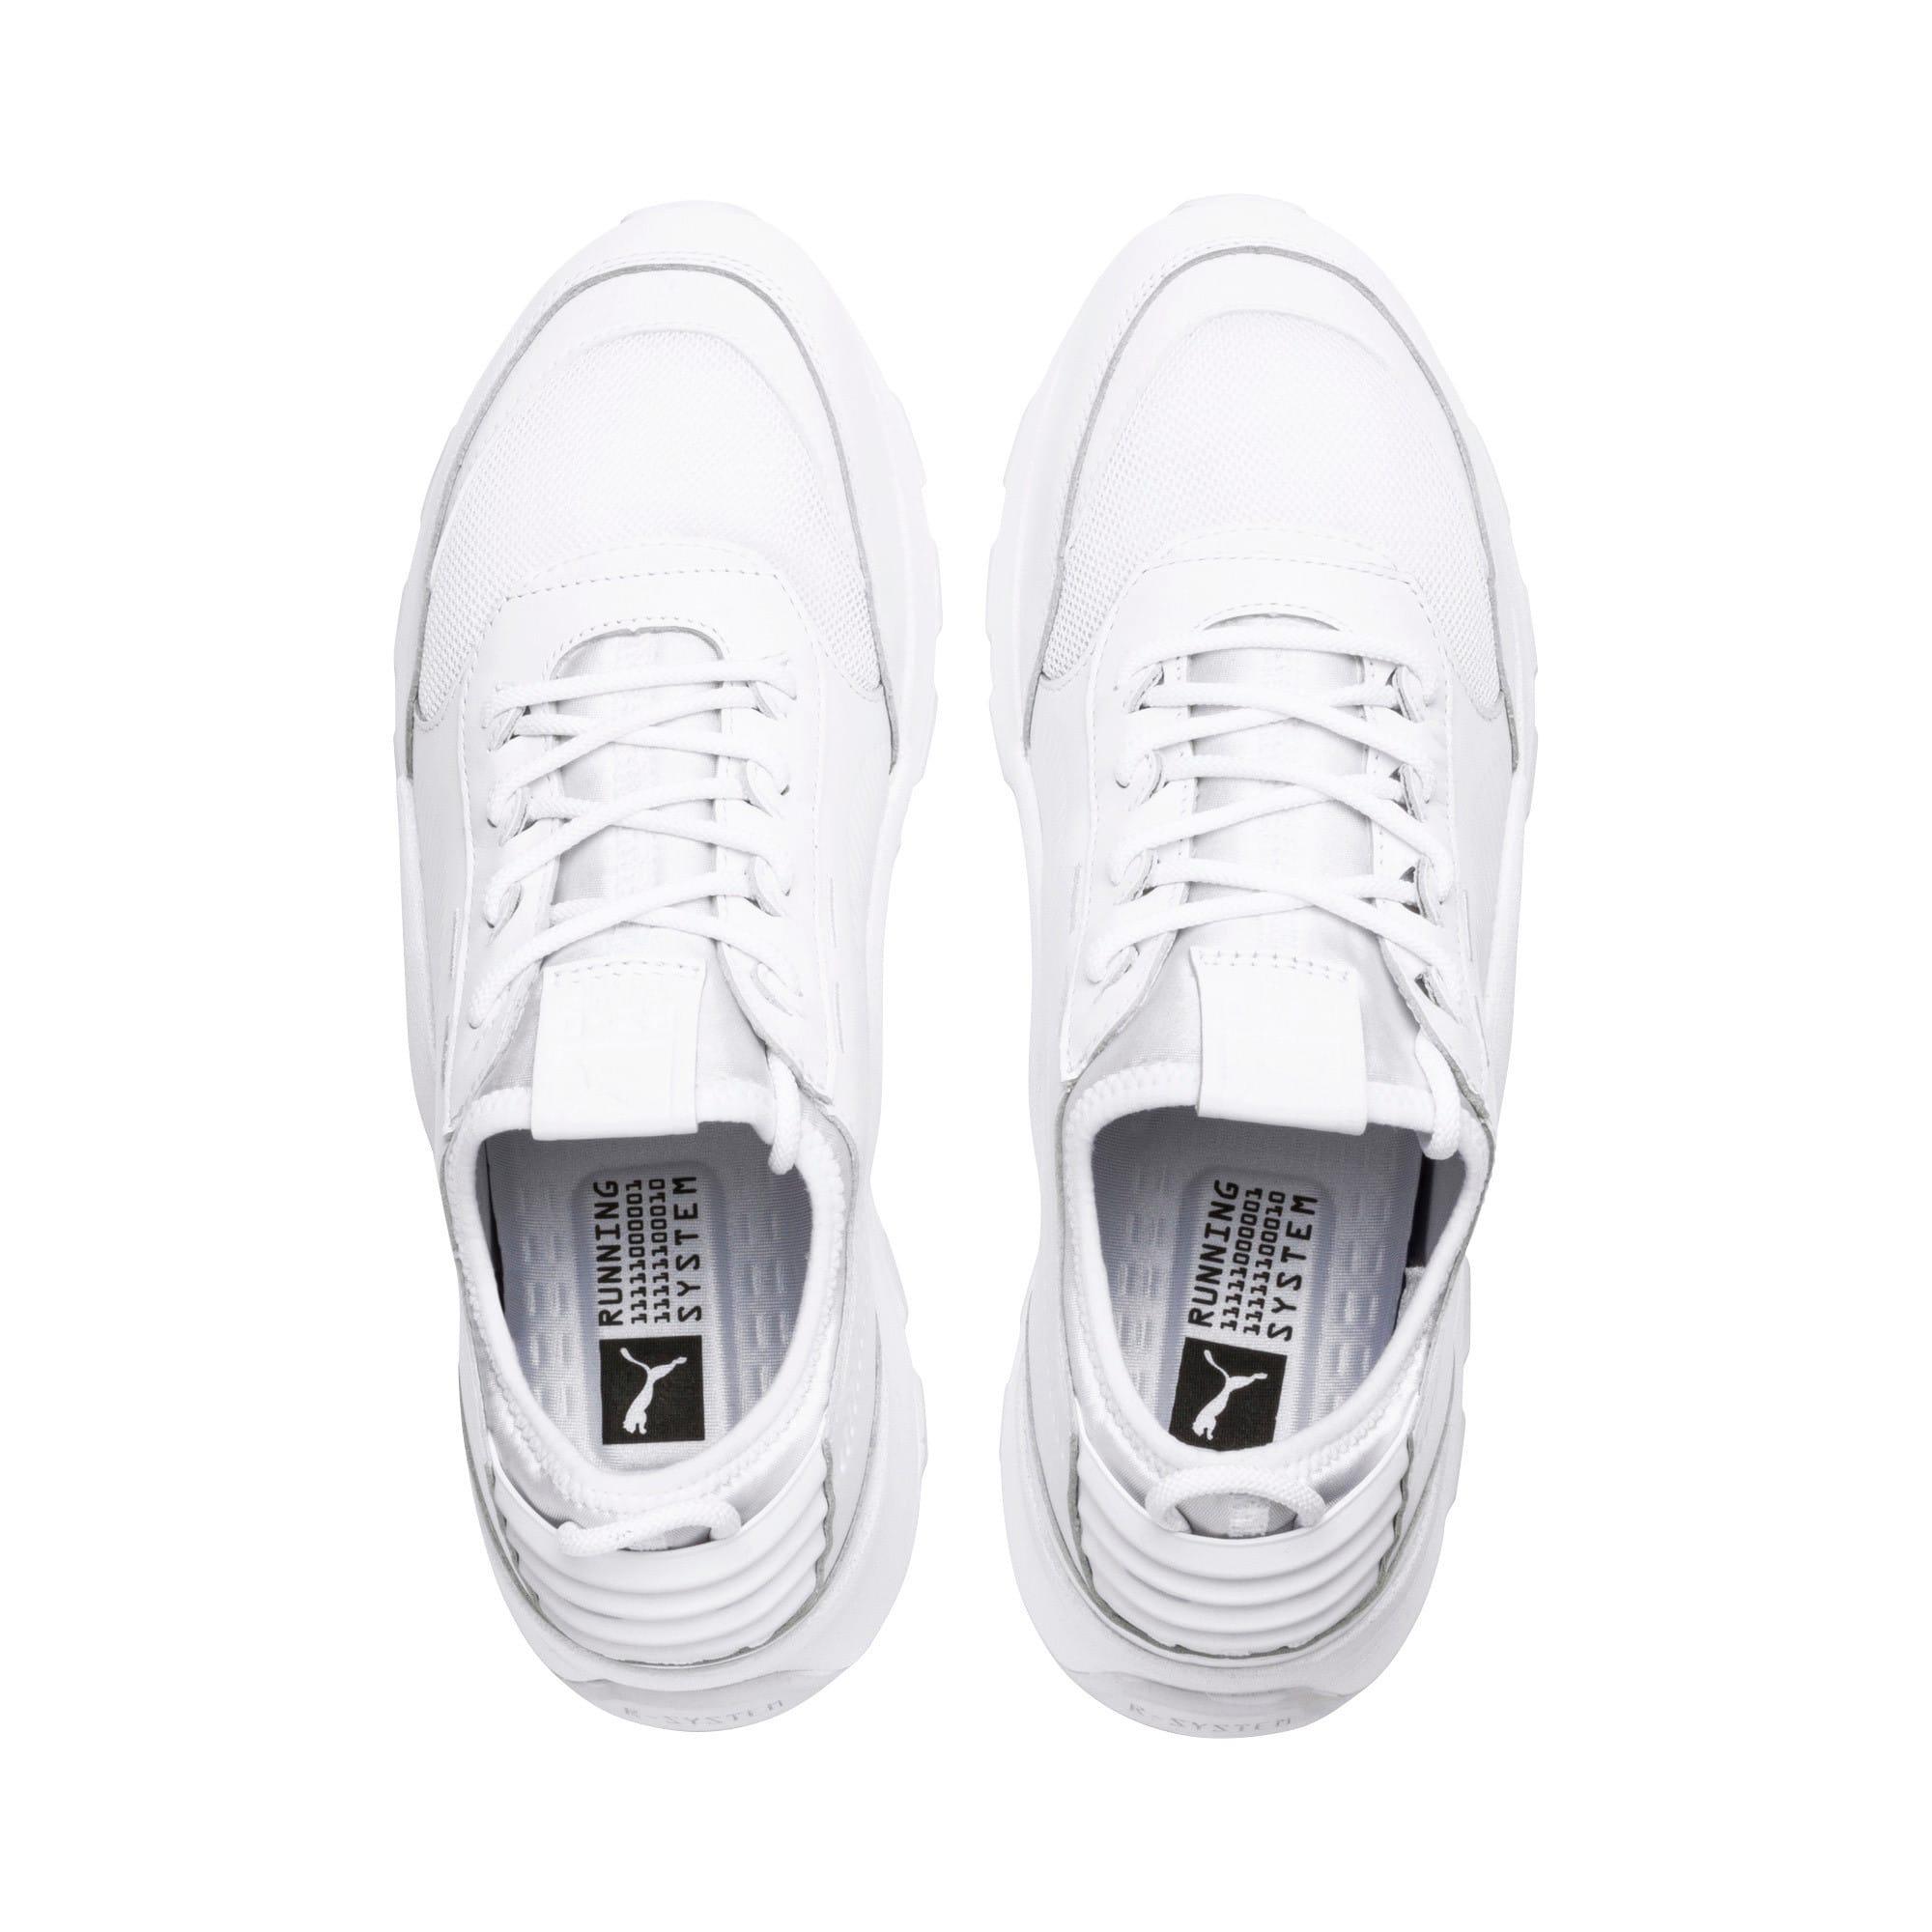 Thumbnail 6 of Evolution RS-0 SOUND sneakers, Puma White, medium